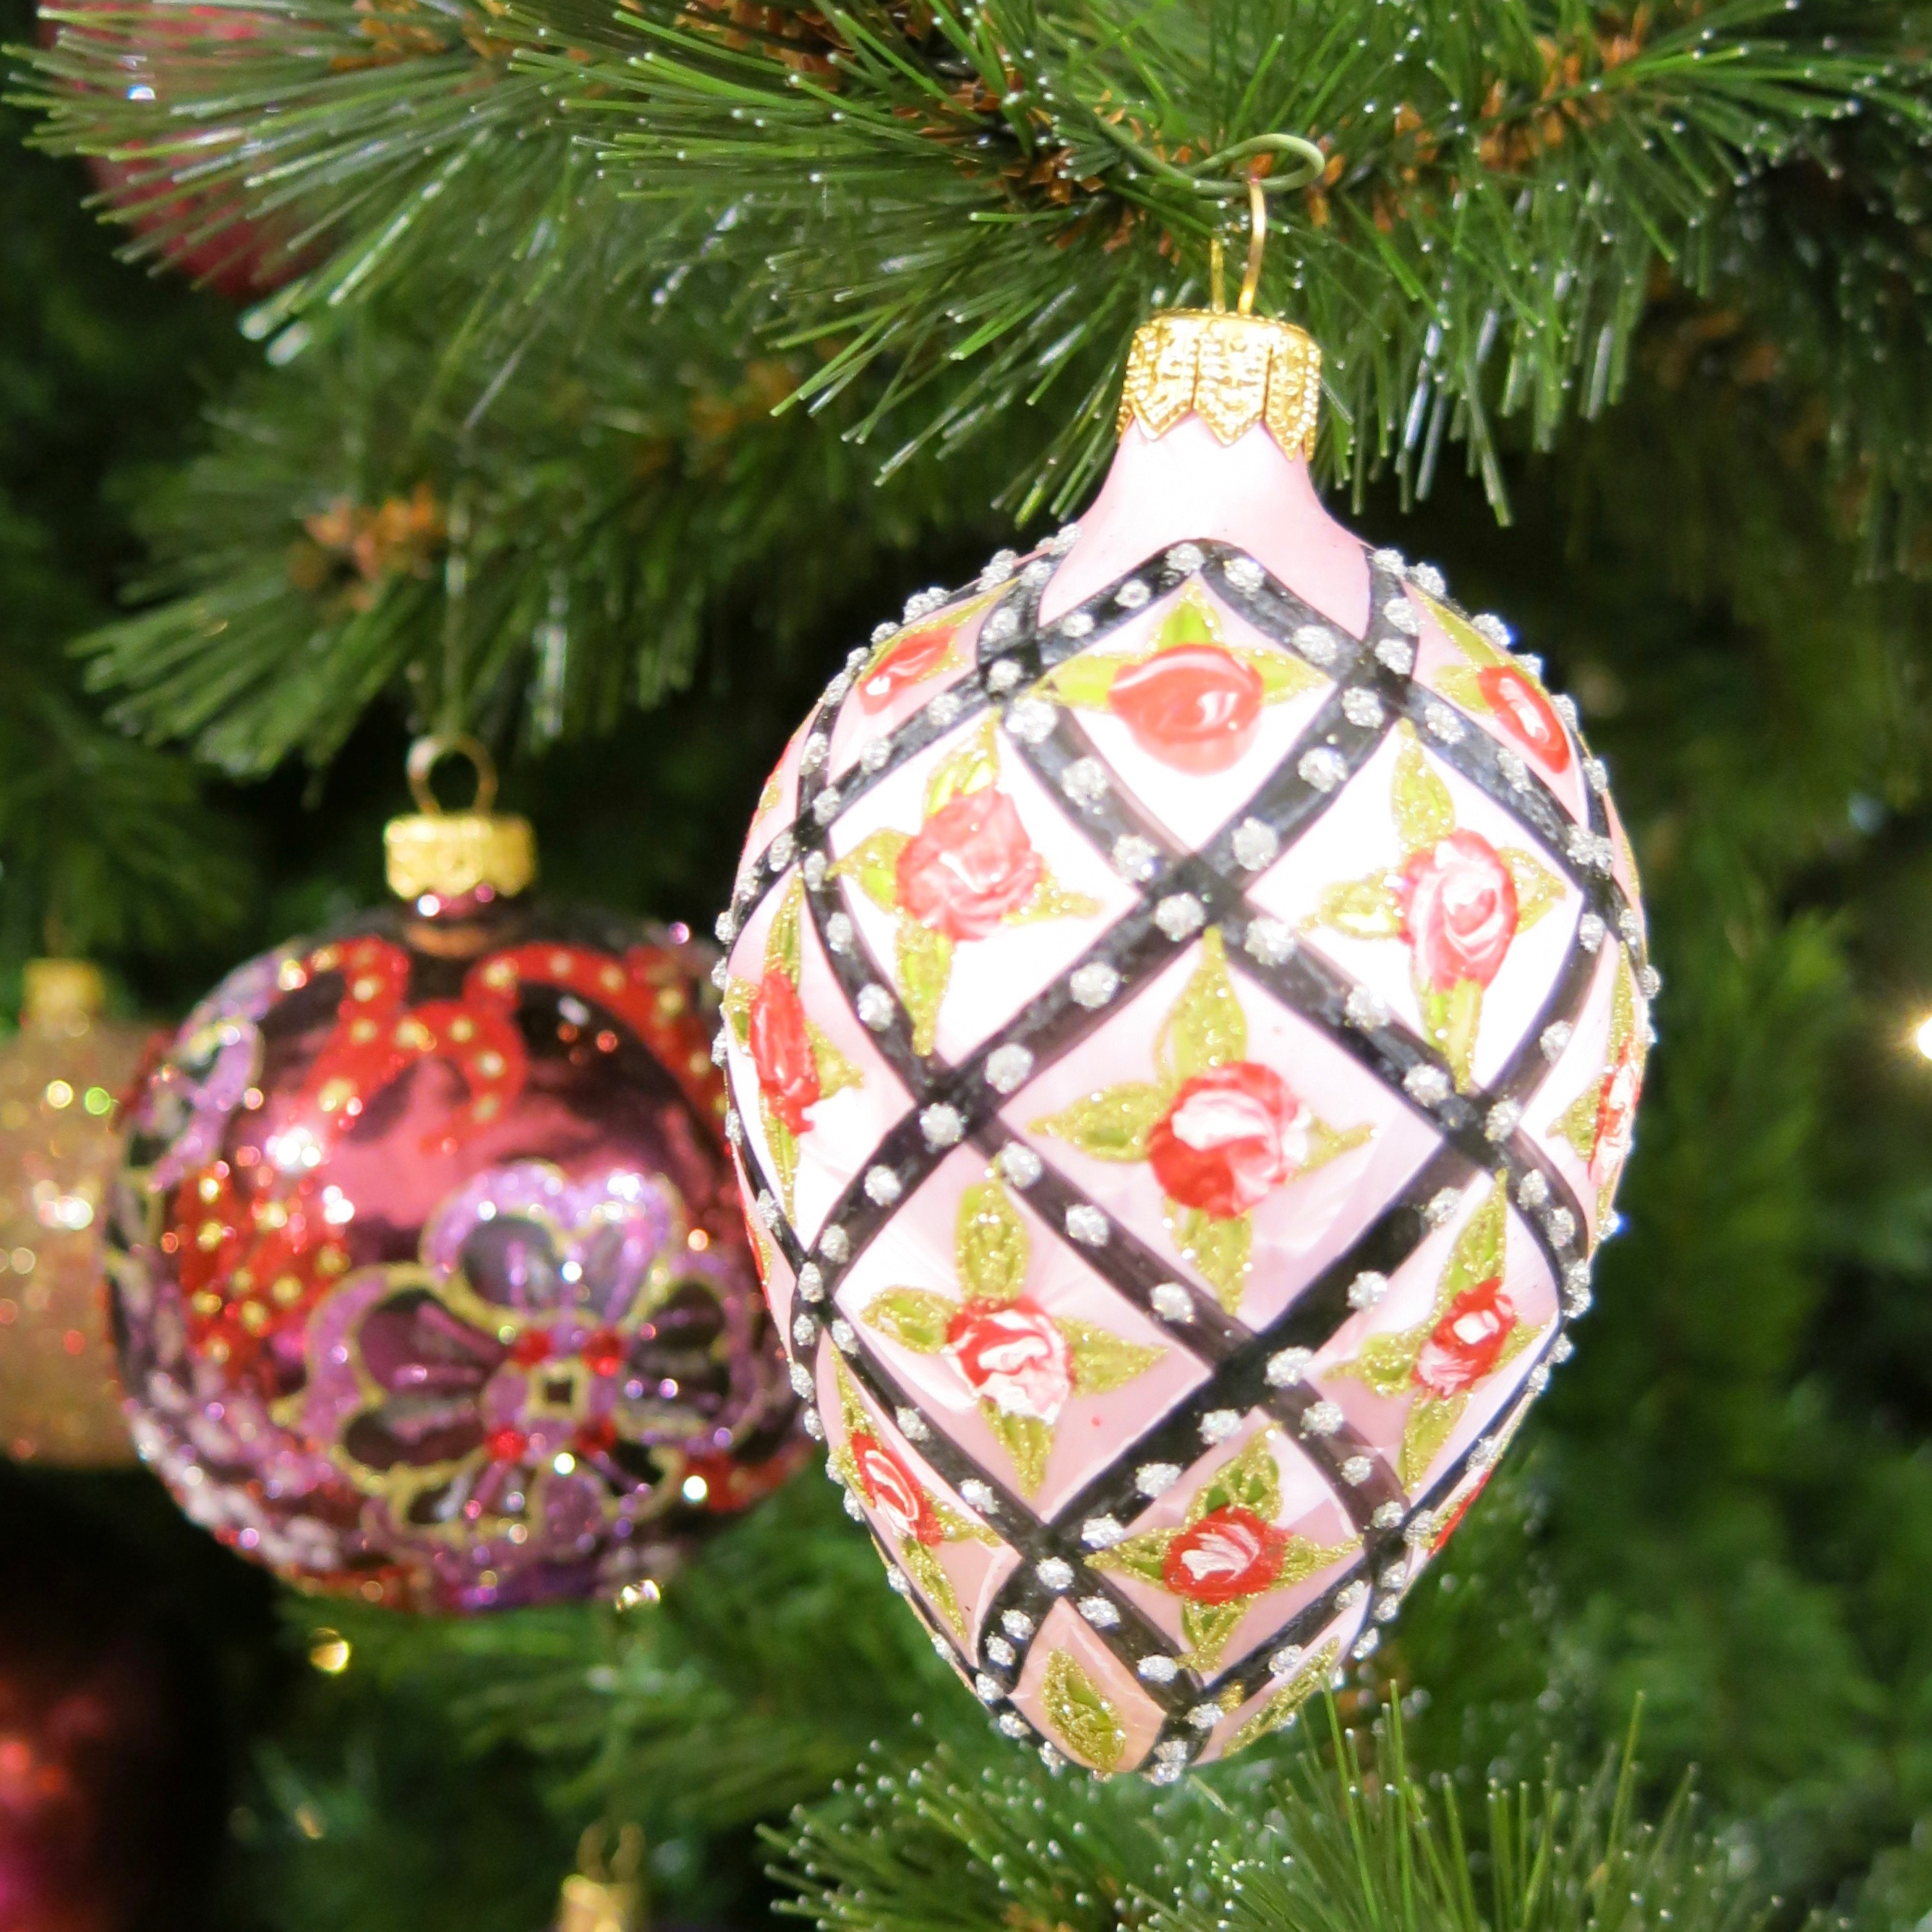 Paris Christmas Ornament.Janice Macleod Christmas Ornaments Of Paris